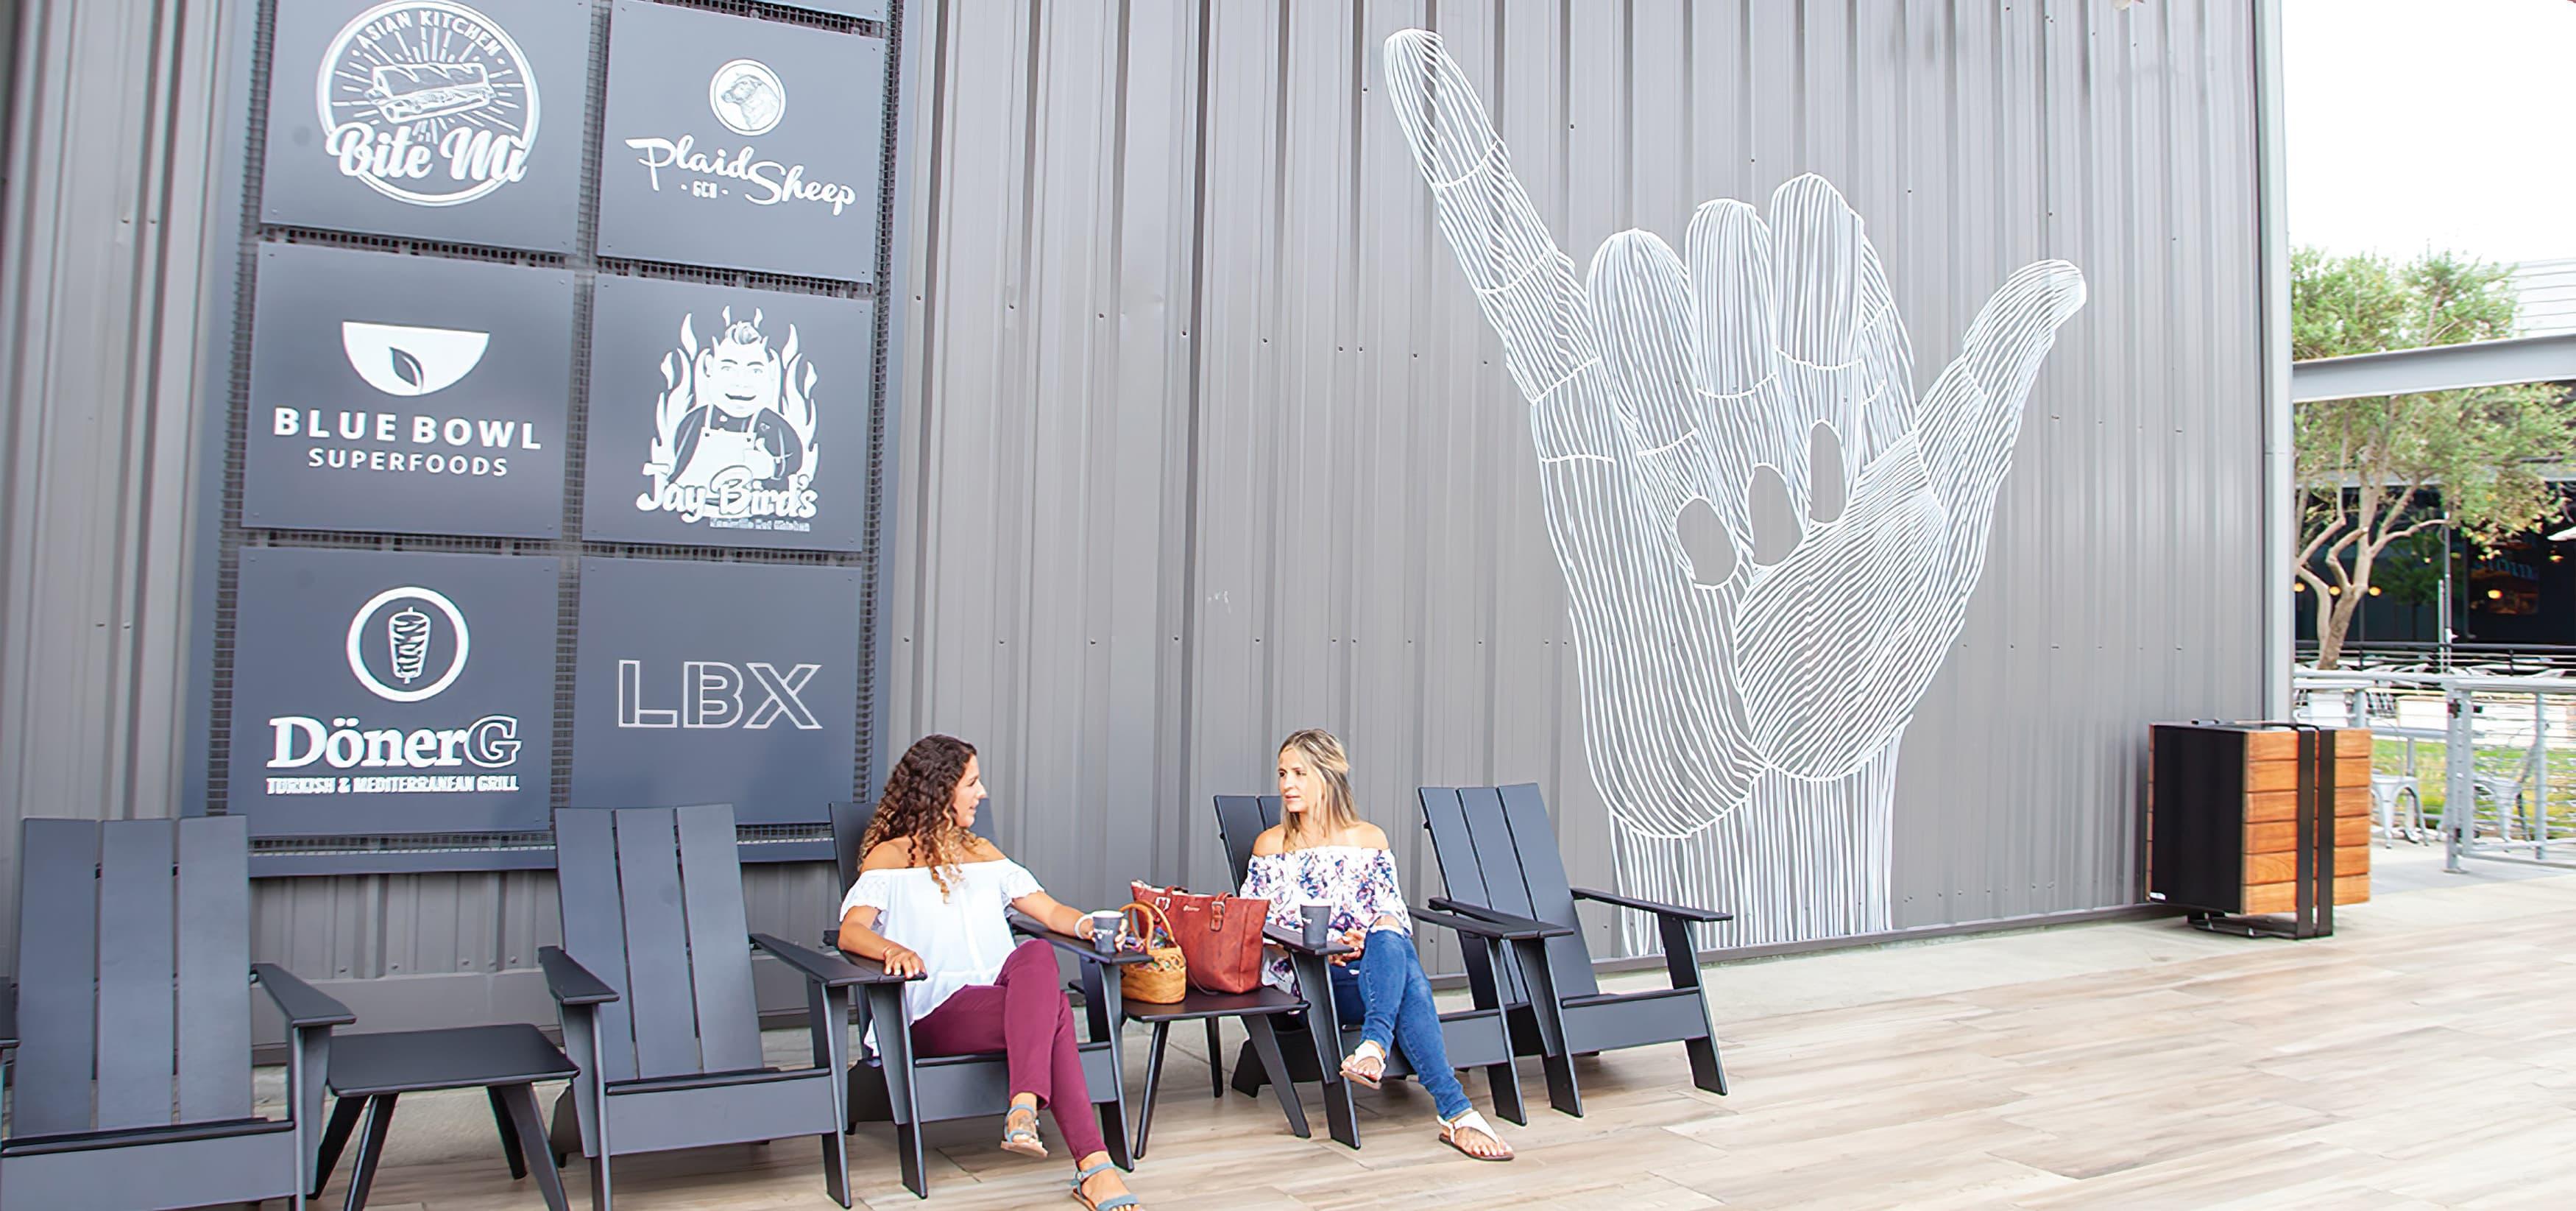 The Hangar, a food hall dining complex at Long Beach Exchange.  Mural Design. Public Art.